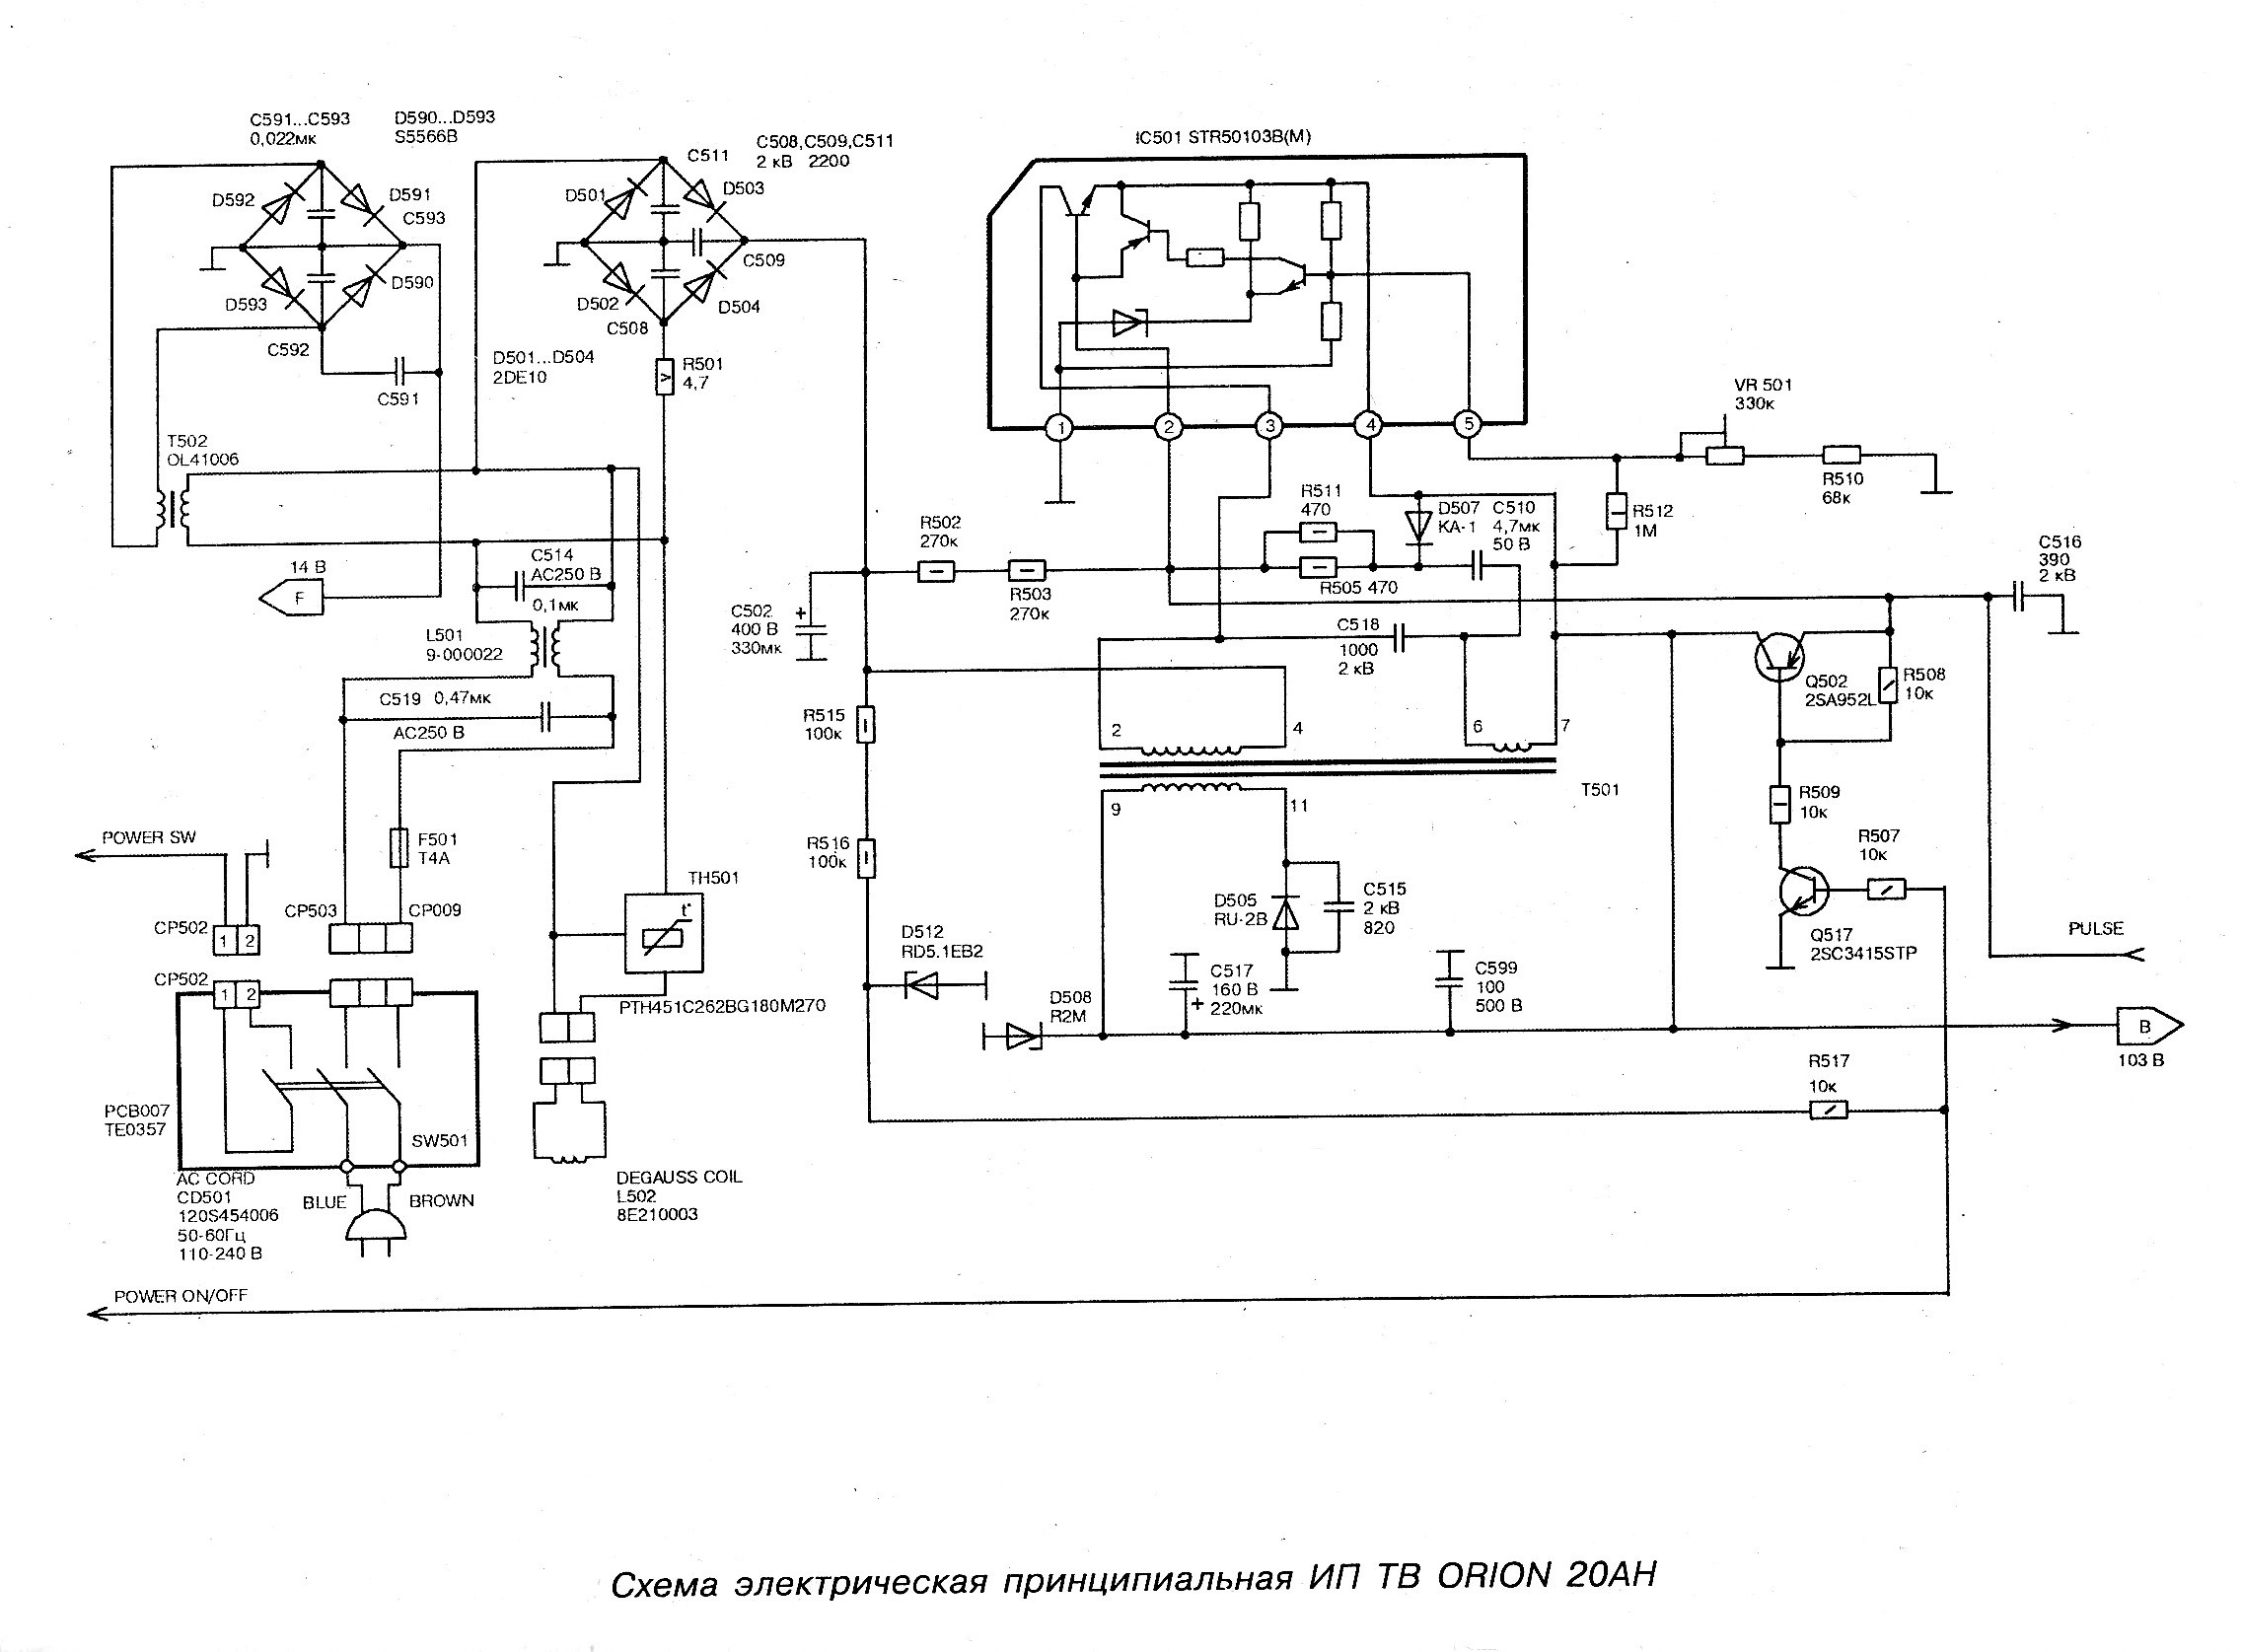 Орион телевизор схема